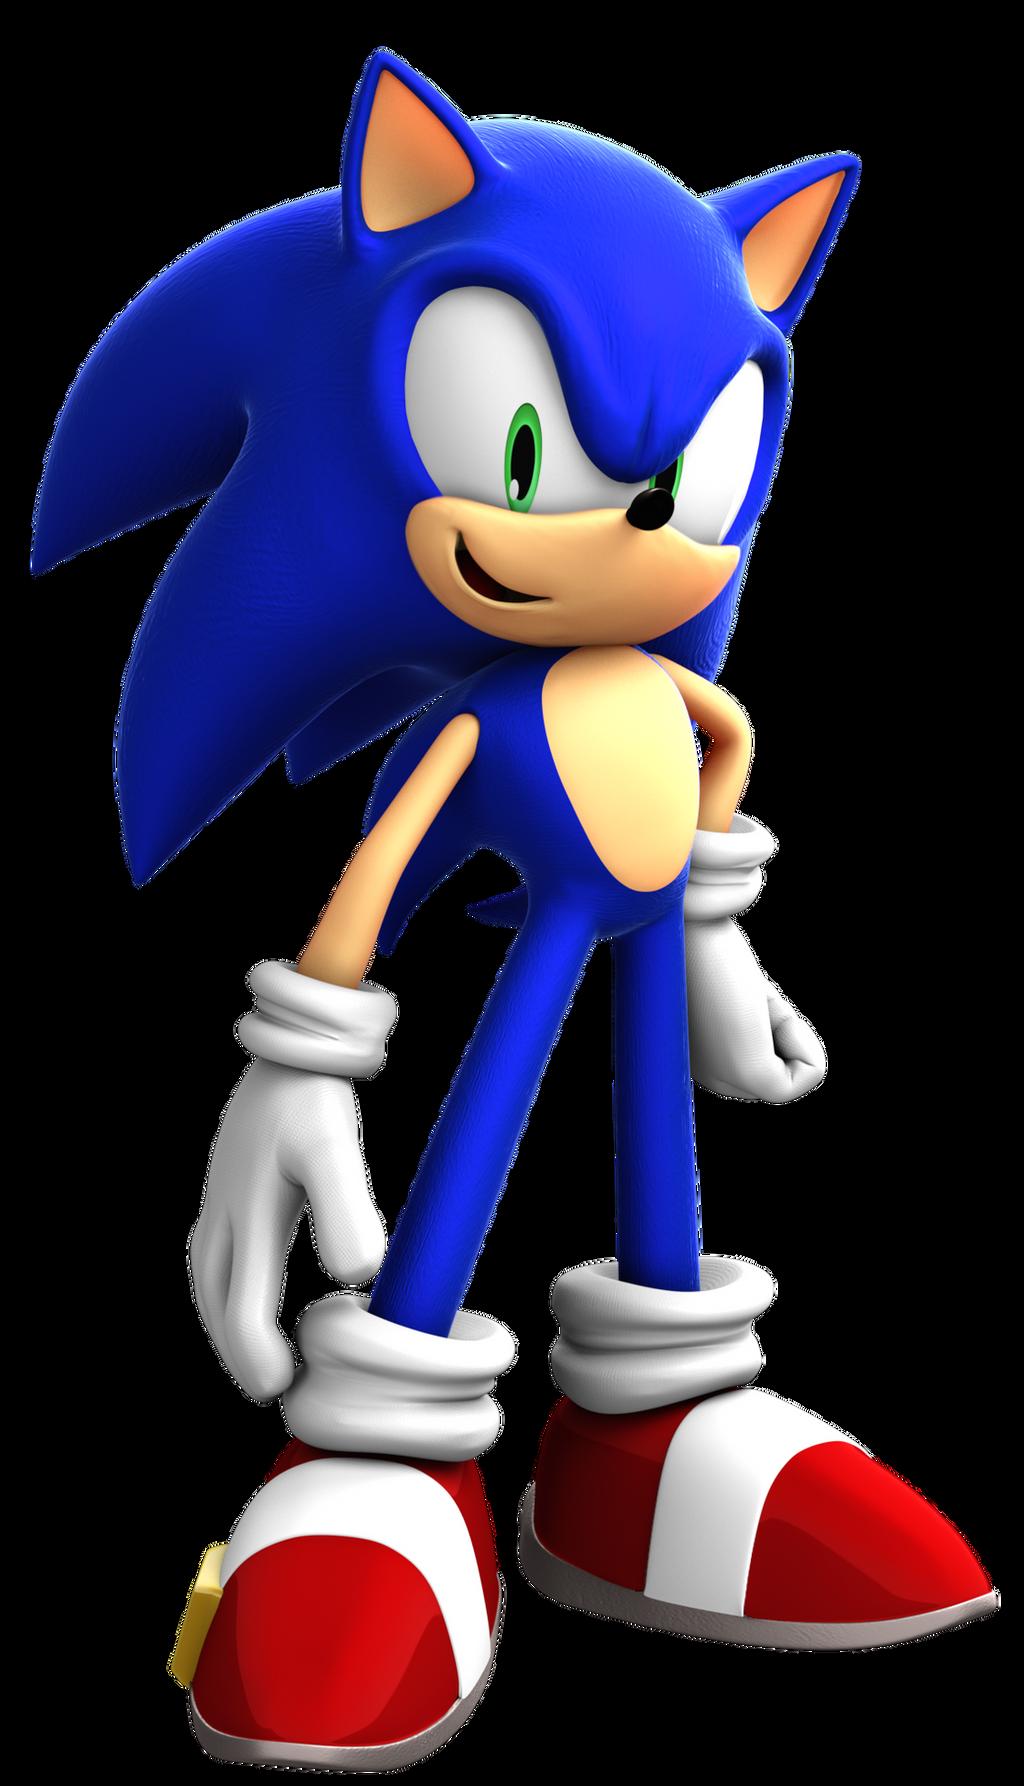 Sonic favorites favourites by Darkdealer65 on DeviantArt